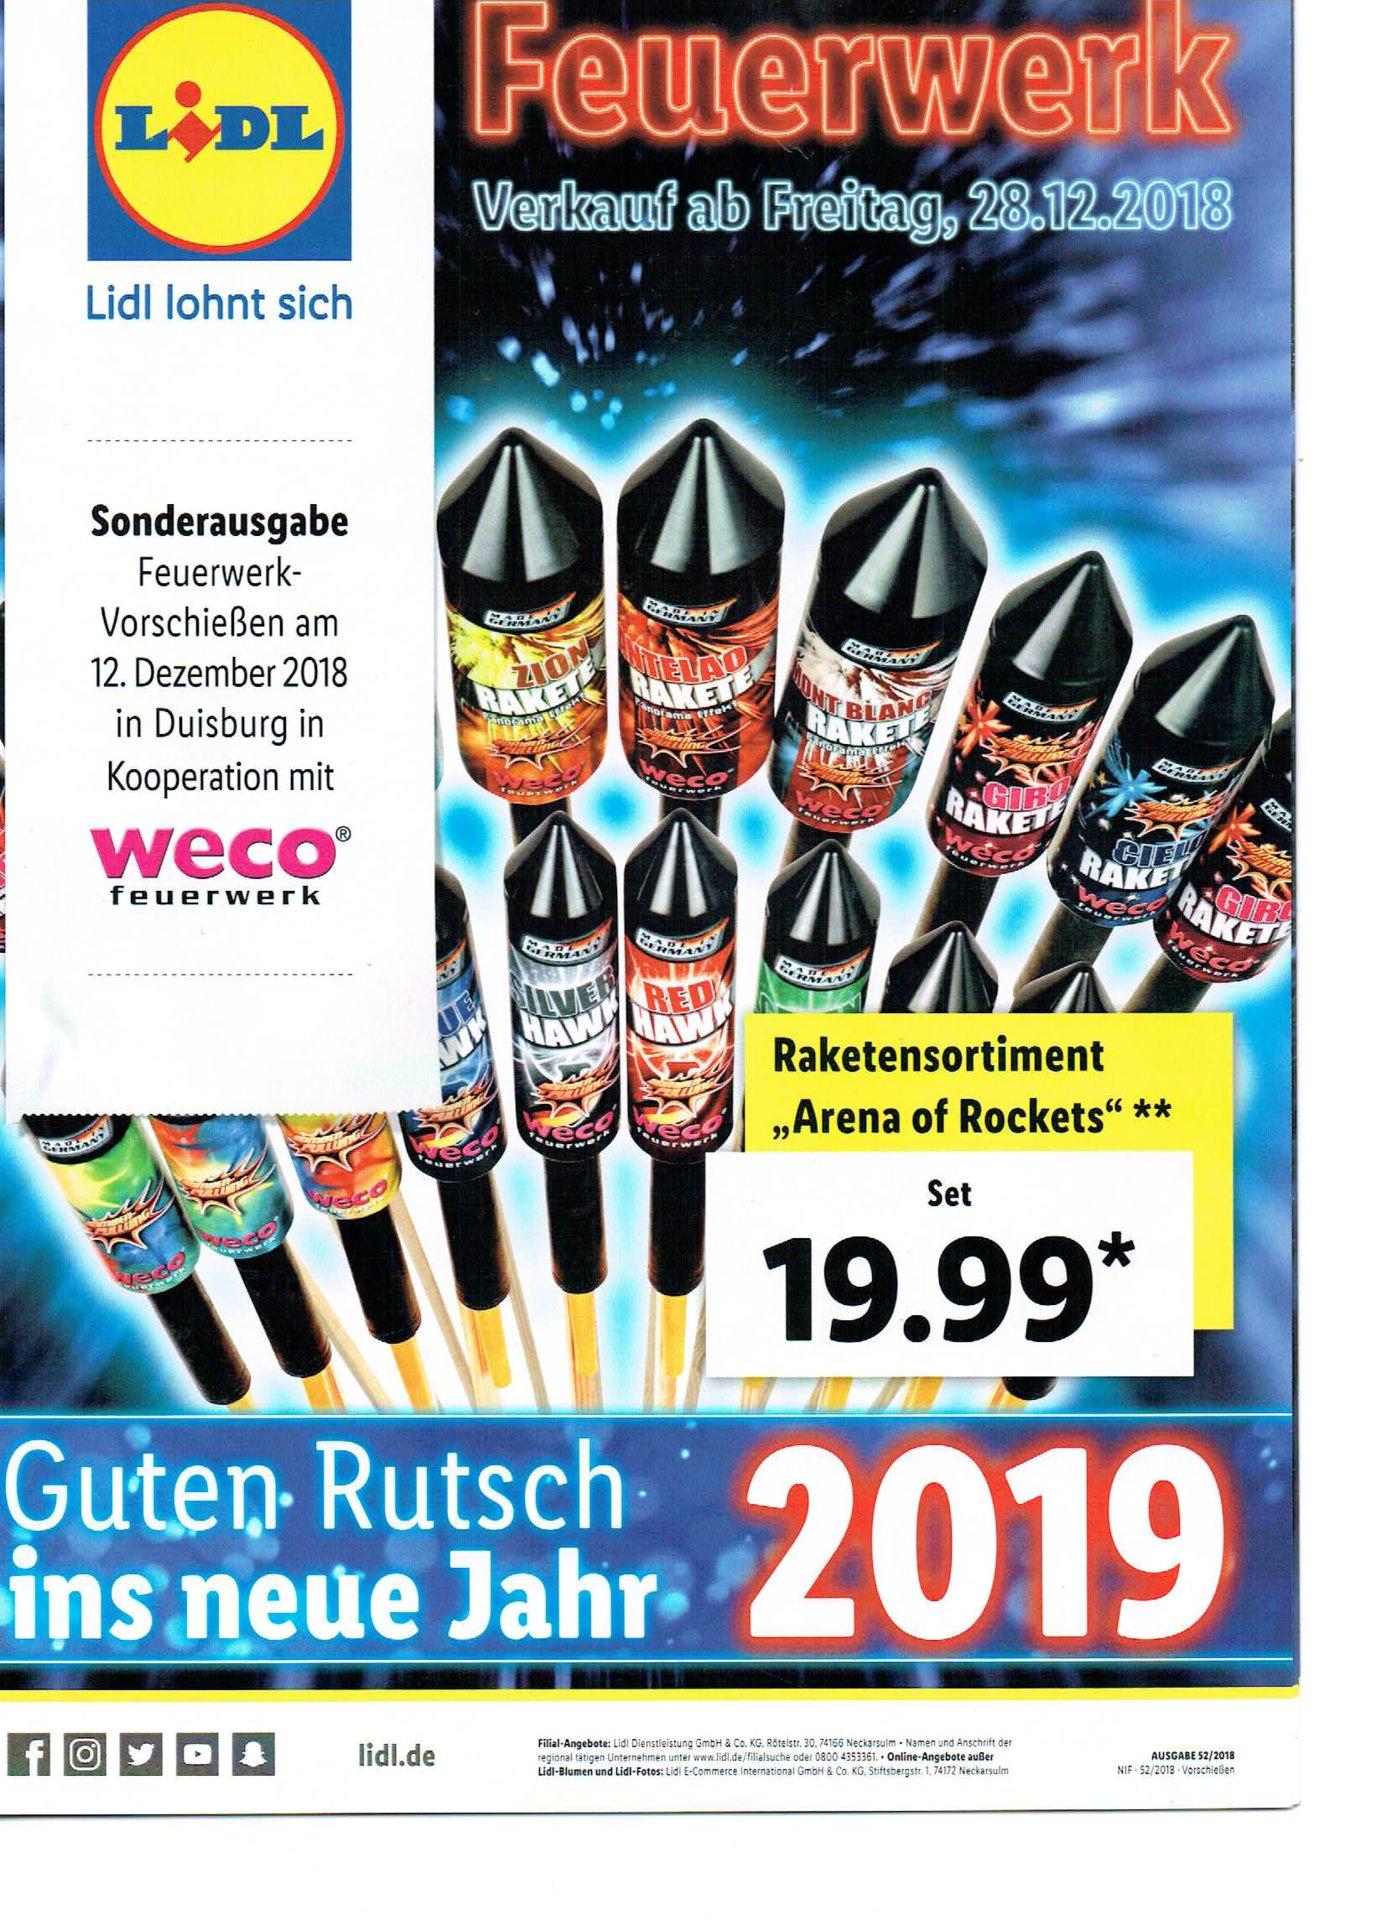 2018 Lidl 2018 Feuerwerk Forum